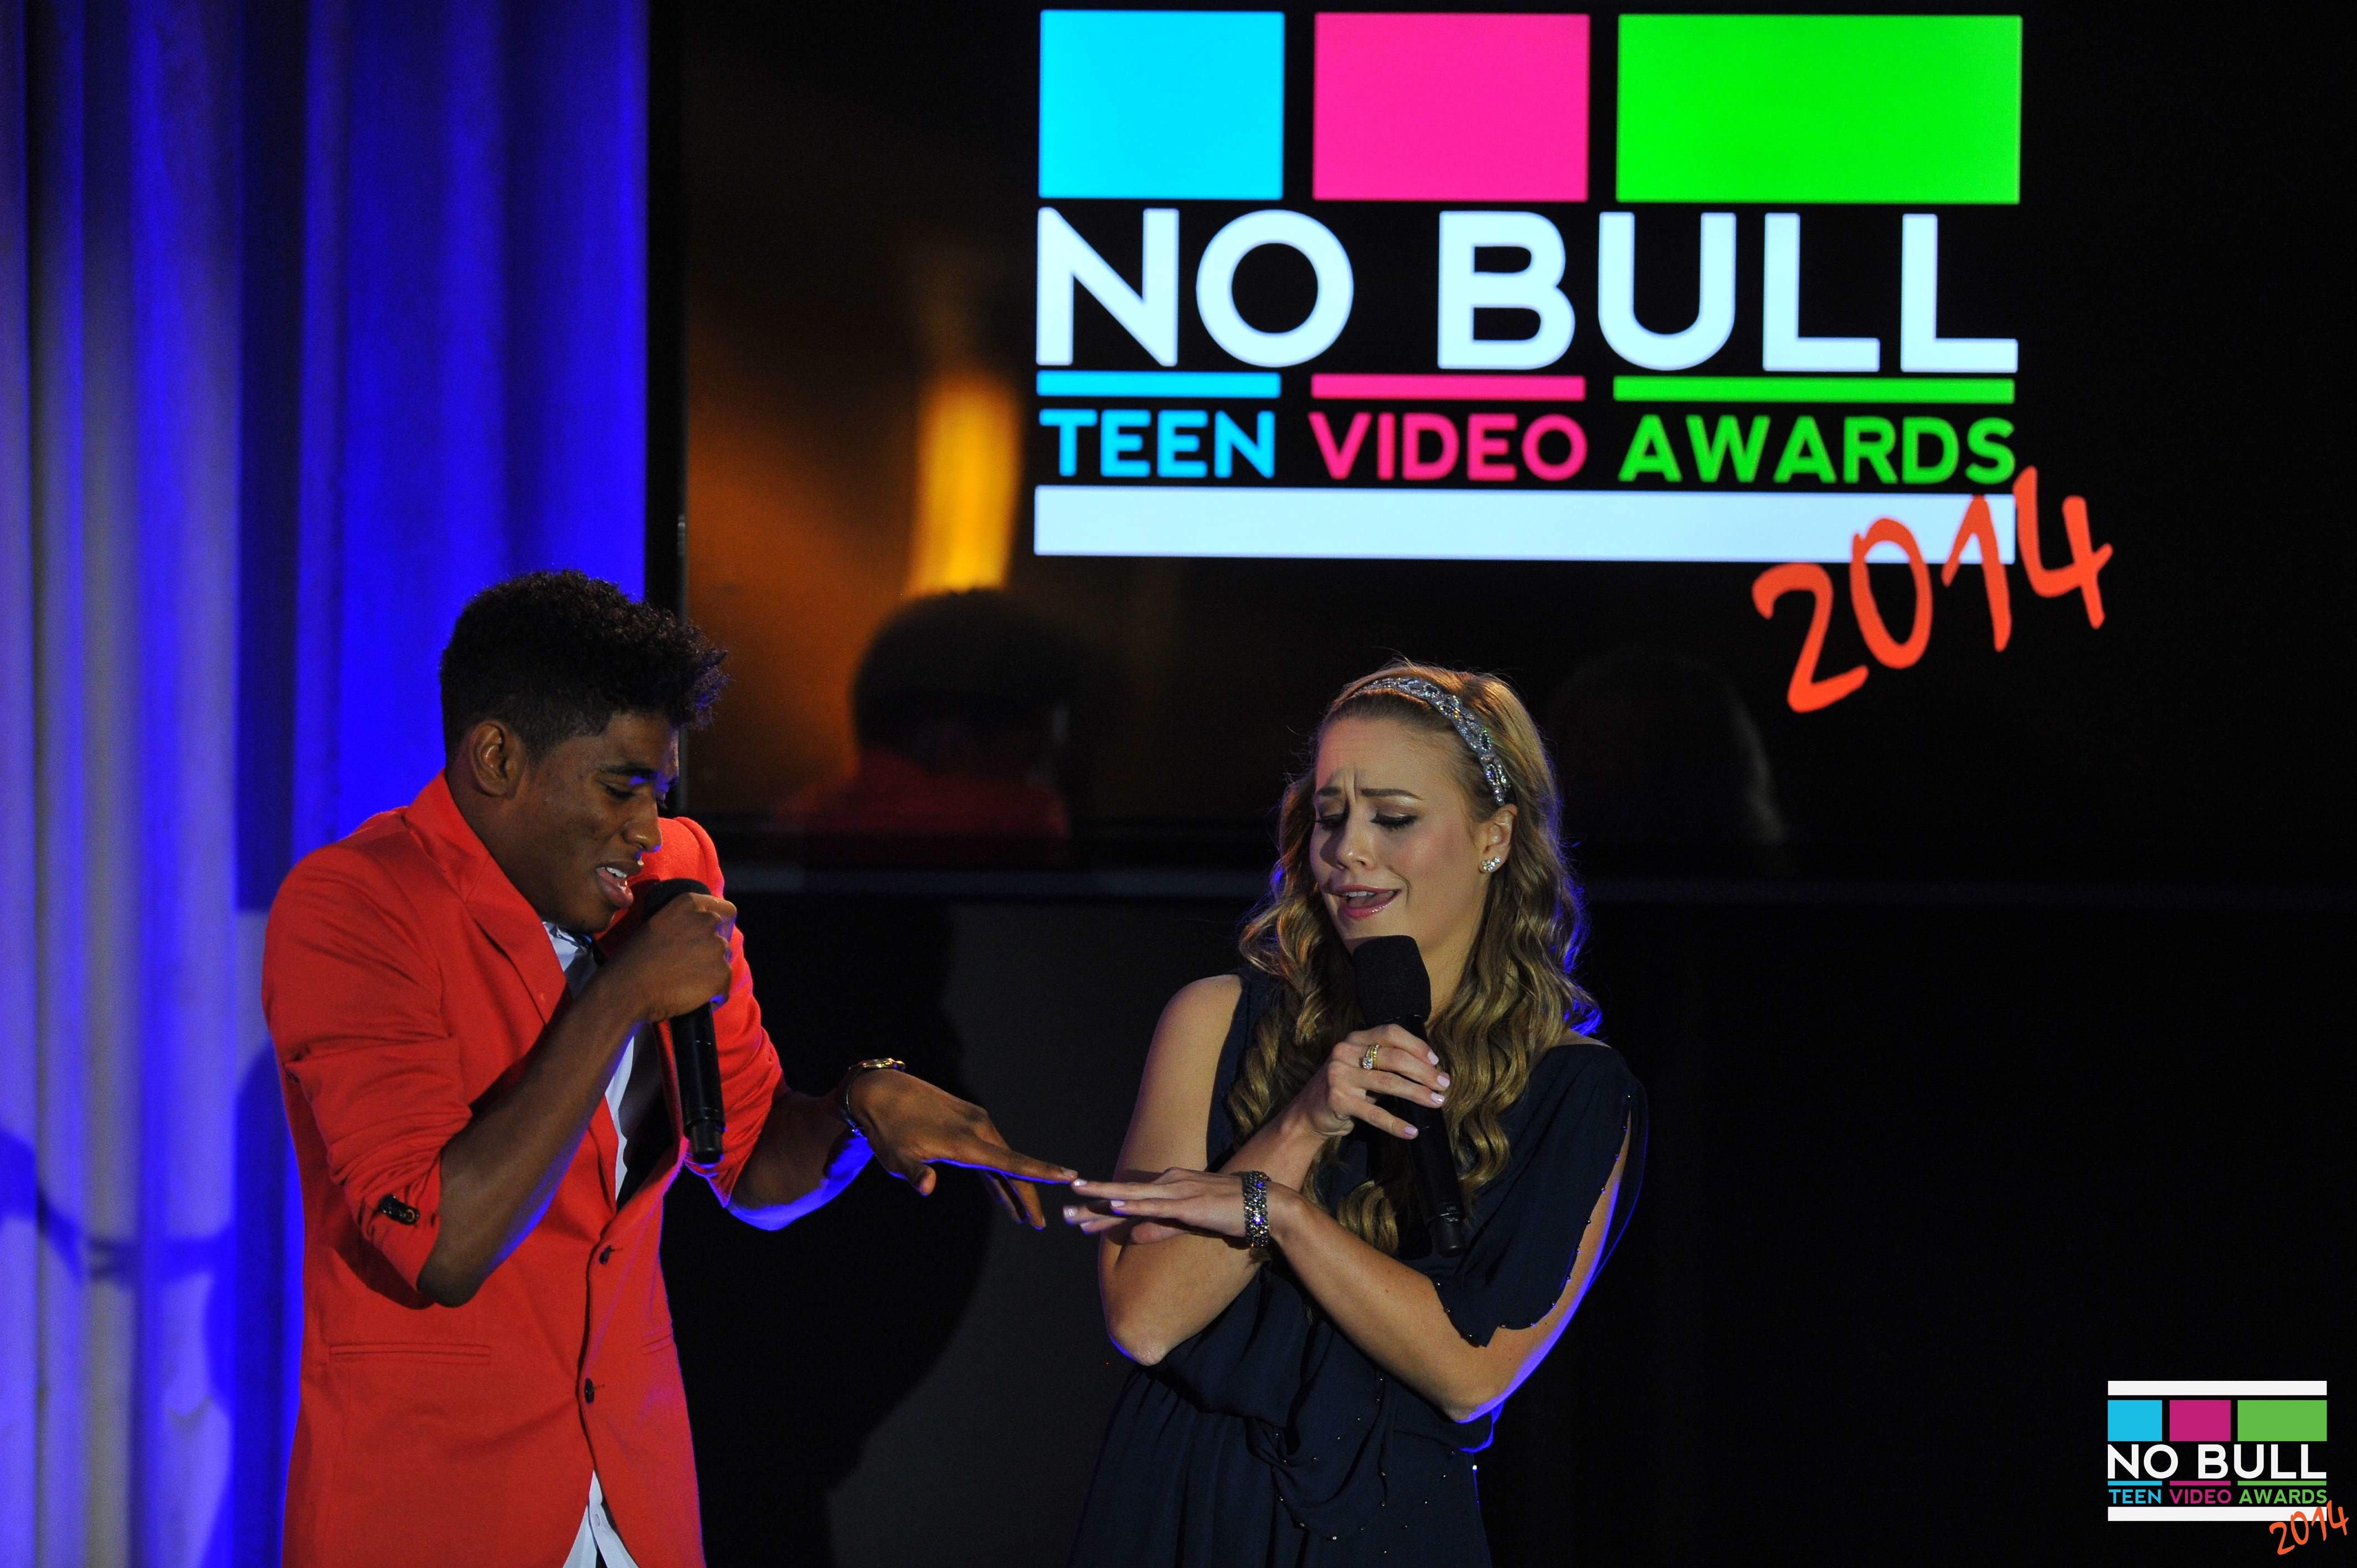 2014 Teen Video Awards - Hosts